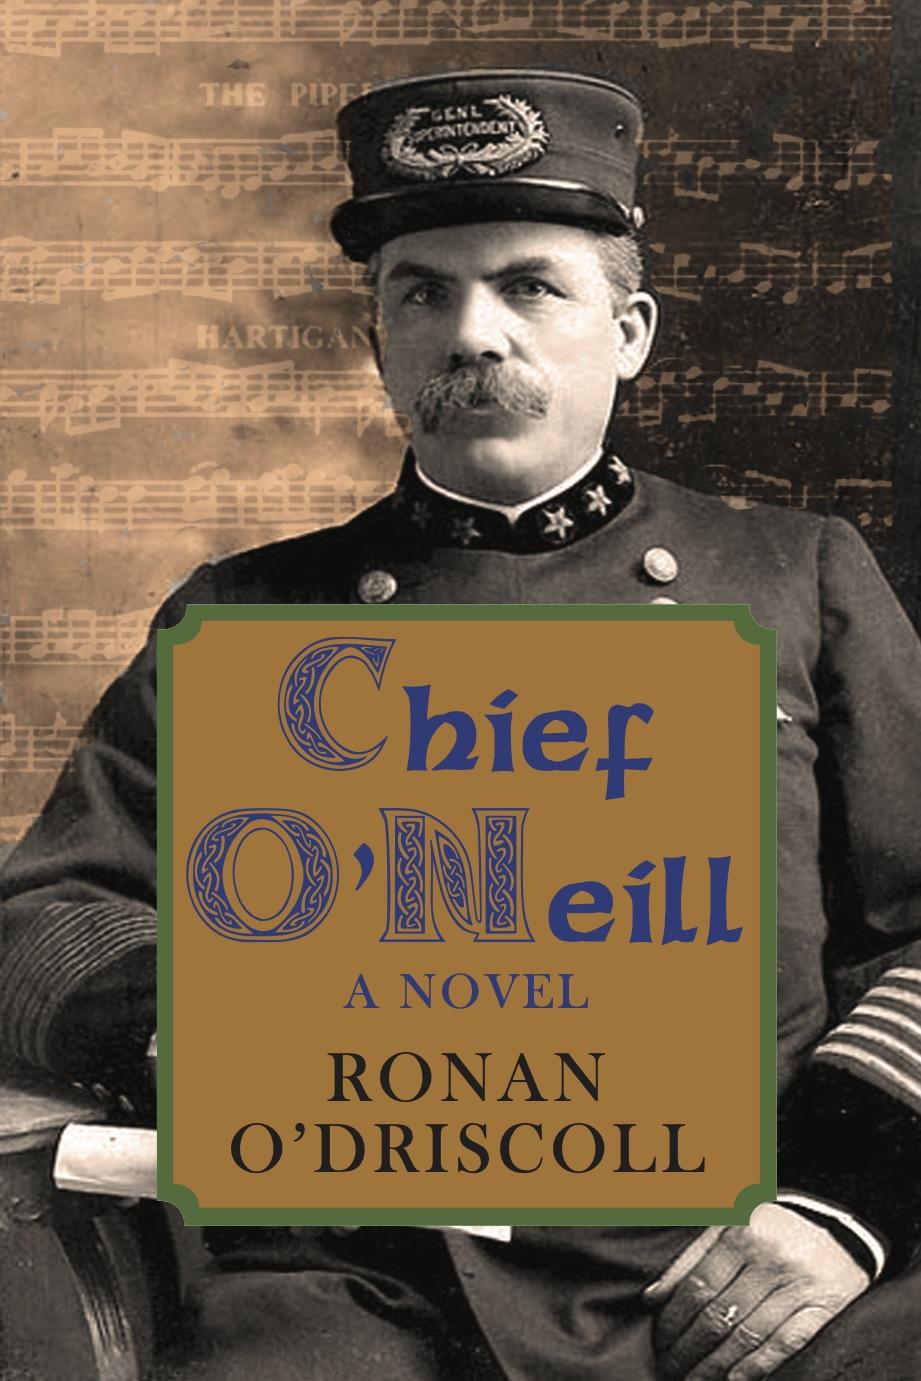 Author Ronan O'Driscoll on his new novel Chief O'Neill